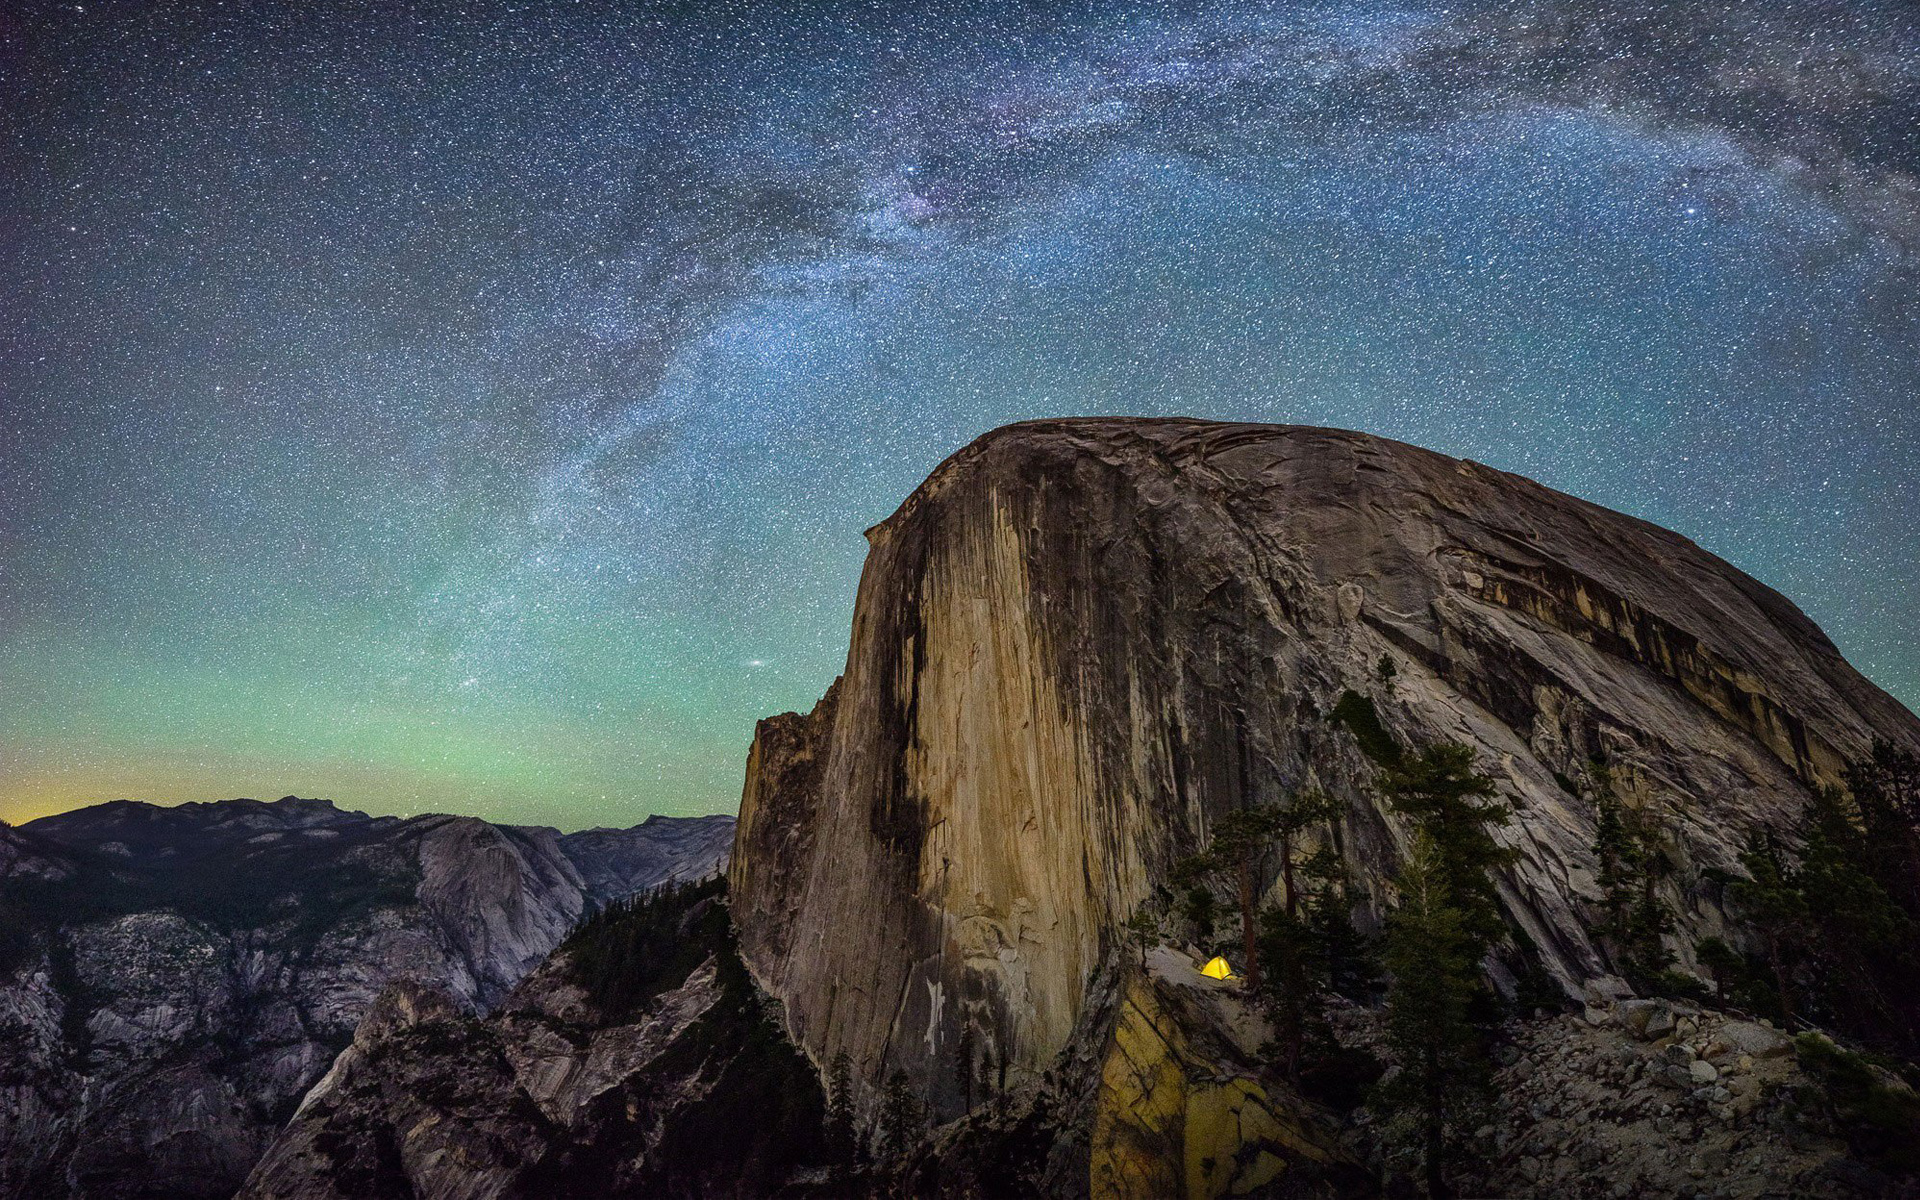 Yosemite Camp Wallpapers HD Wallpapers 1920x1200